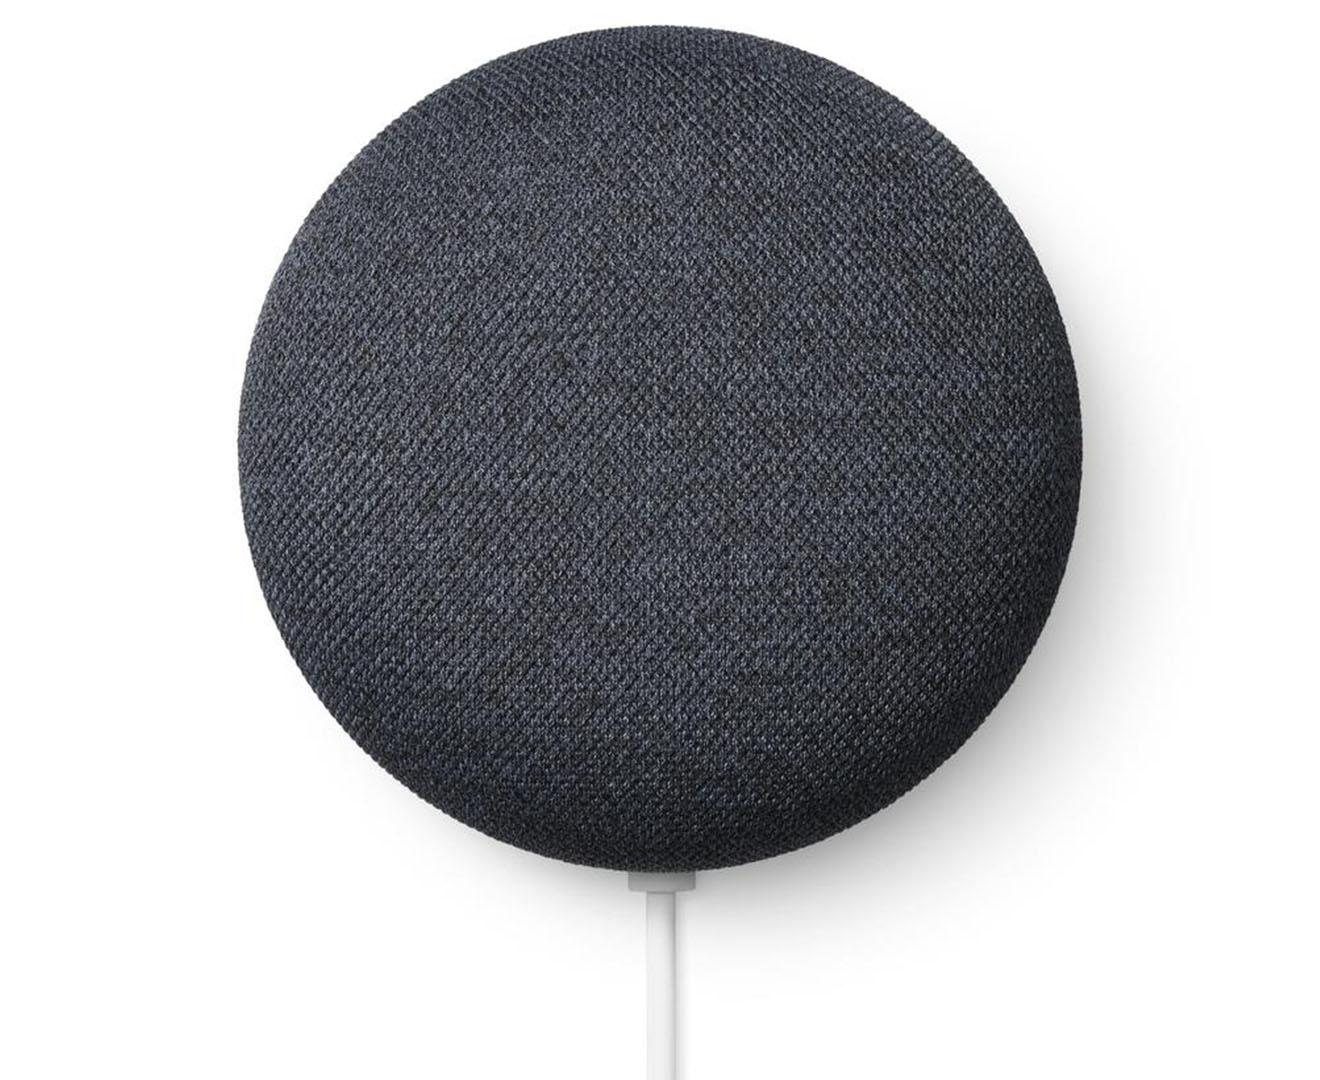 Google Nest Mini Smart Speaker (2nd Gen) - Charcoal | Catch.com.au